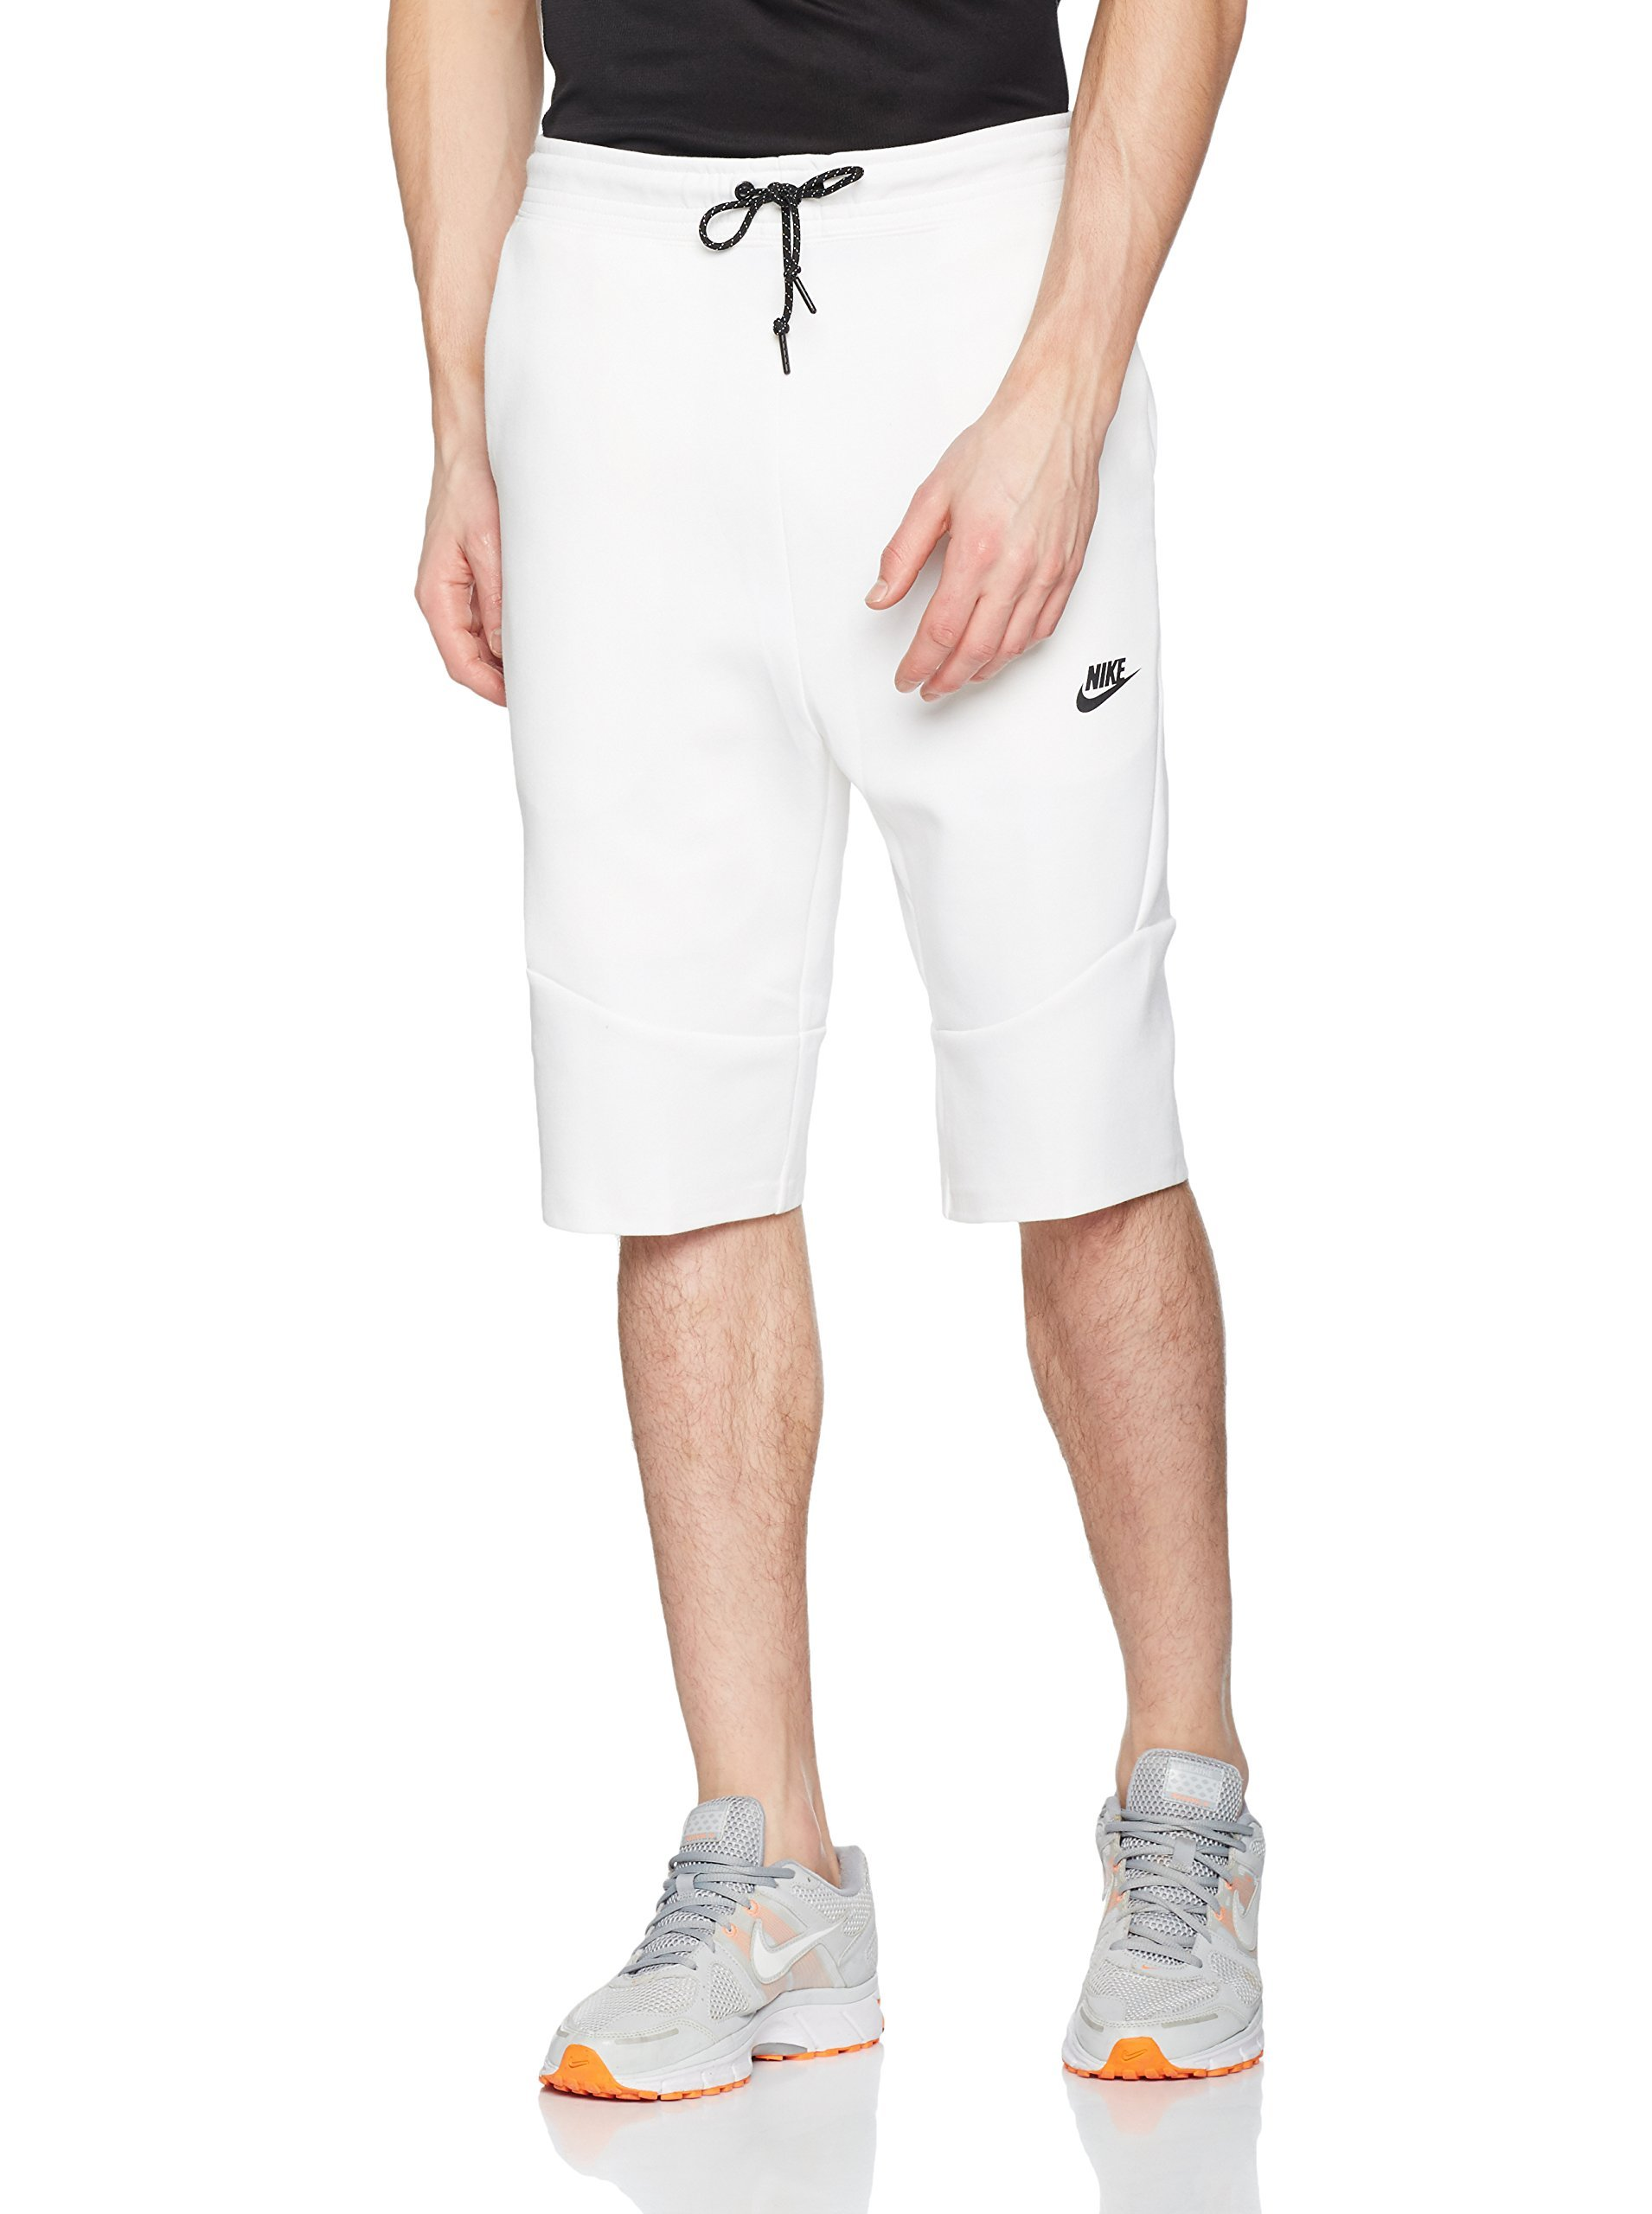 Nike Men's NSW Tech Fleece 2.0 Training Shorts 727357-100 (Medium) White